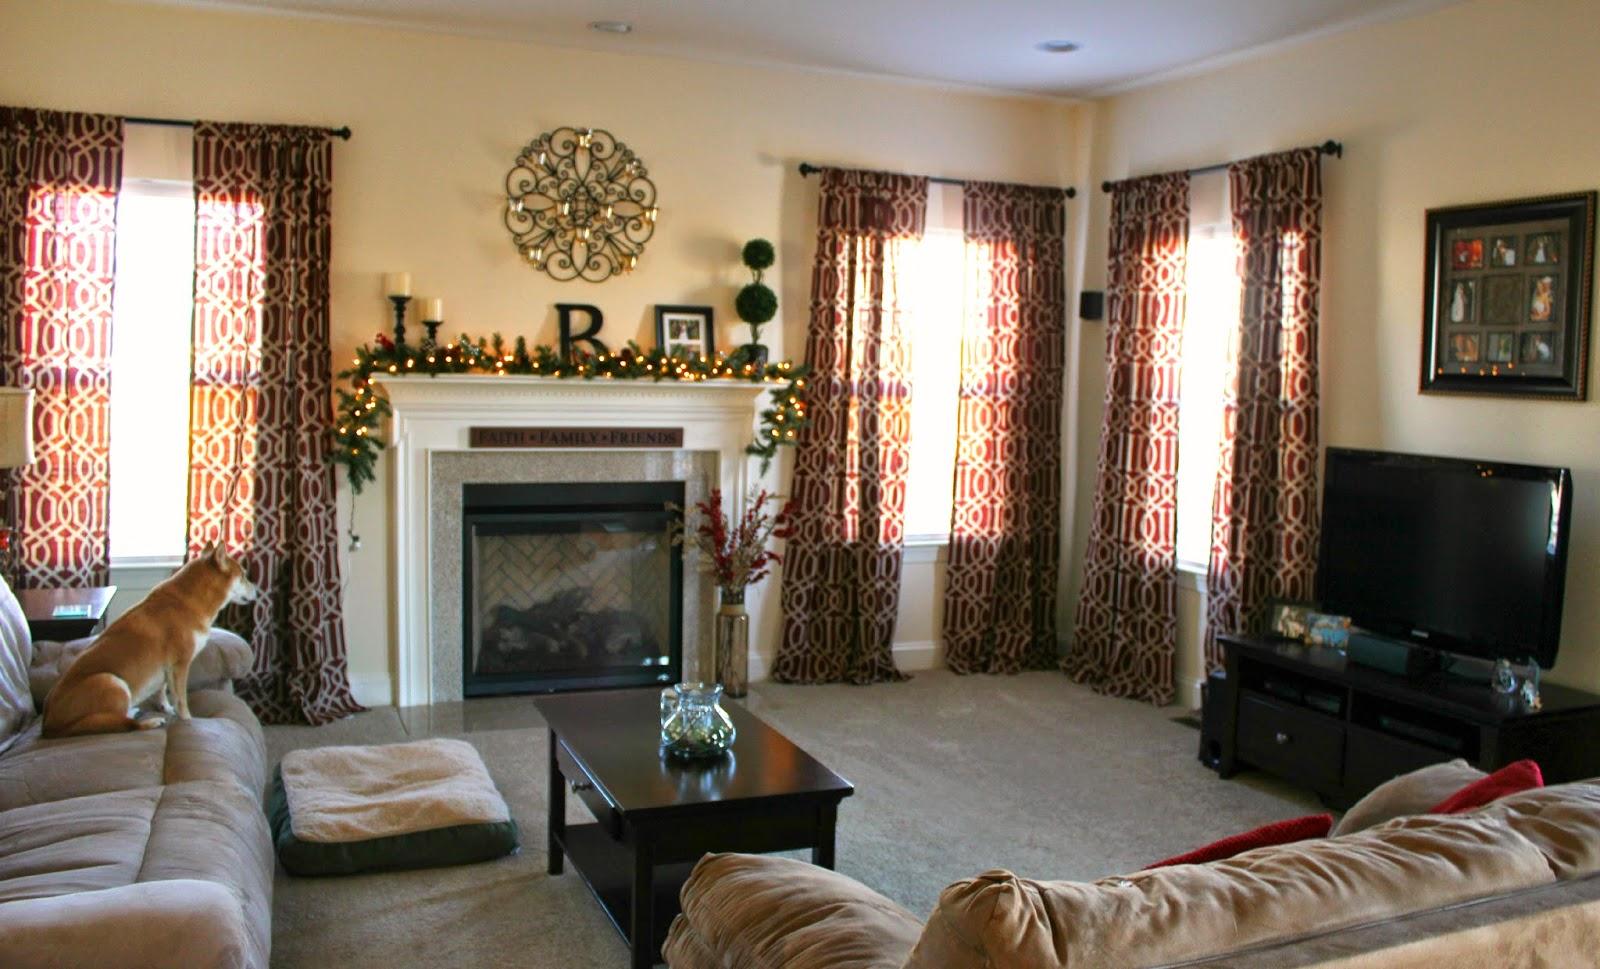 BentleyBlonde: Spring Mantle Decorations & Kirklands ... on Kirkland's Decor Home Accents id=39168